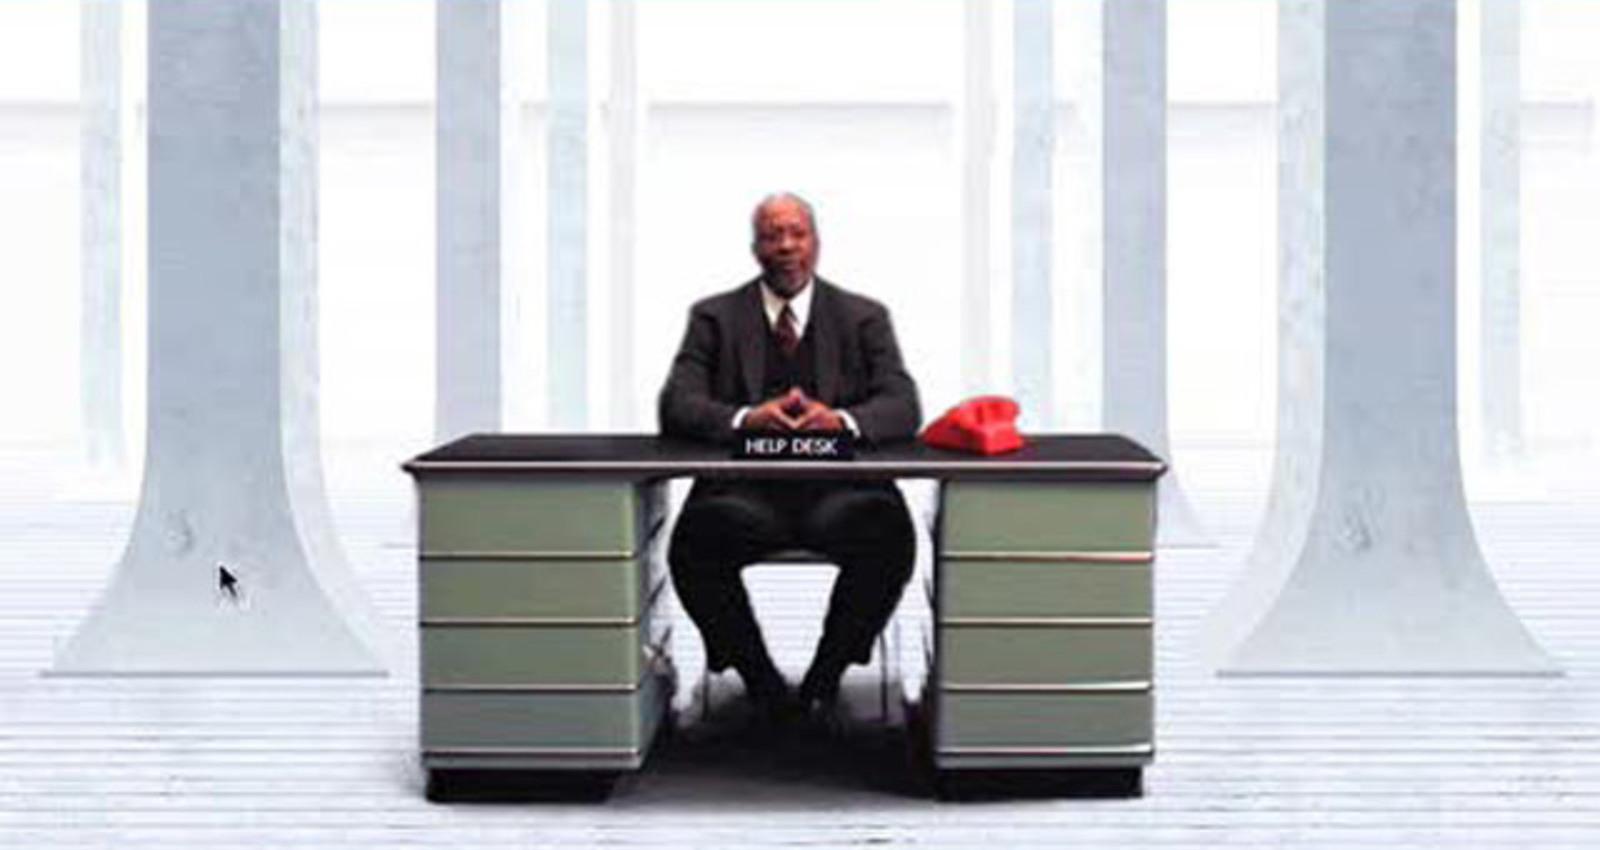 Help Desk II